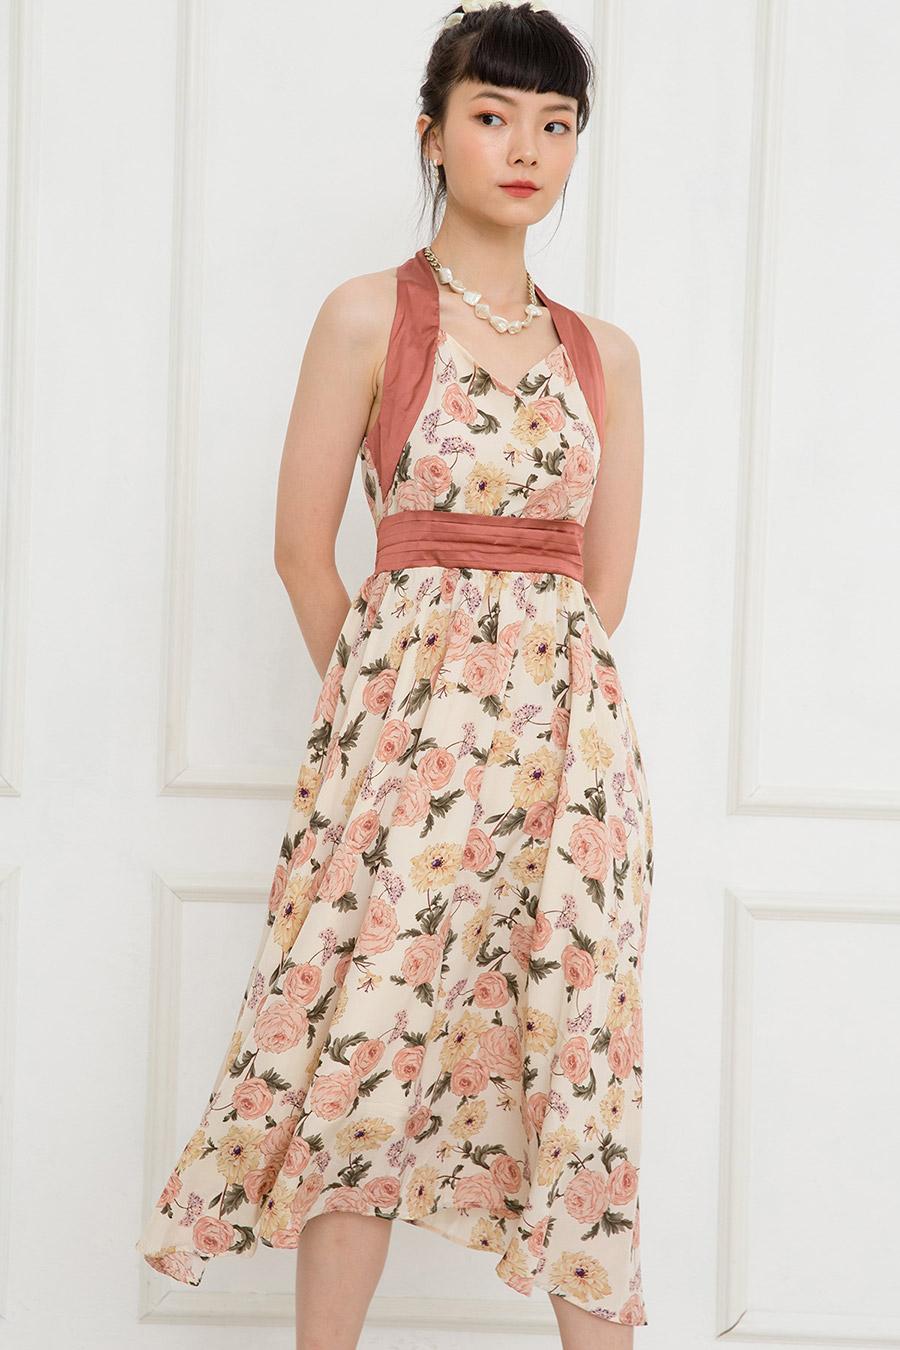 ROSEFIELD DRESS - CREME FLEUR